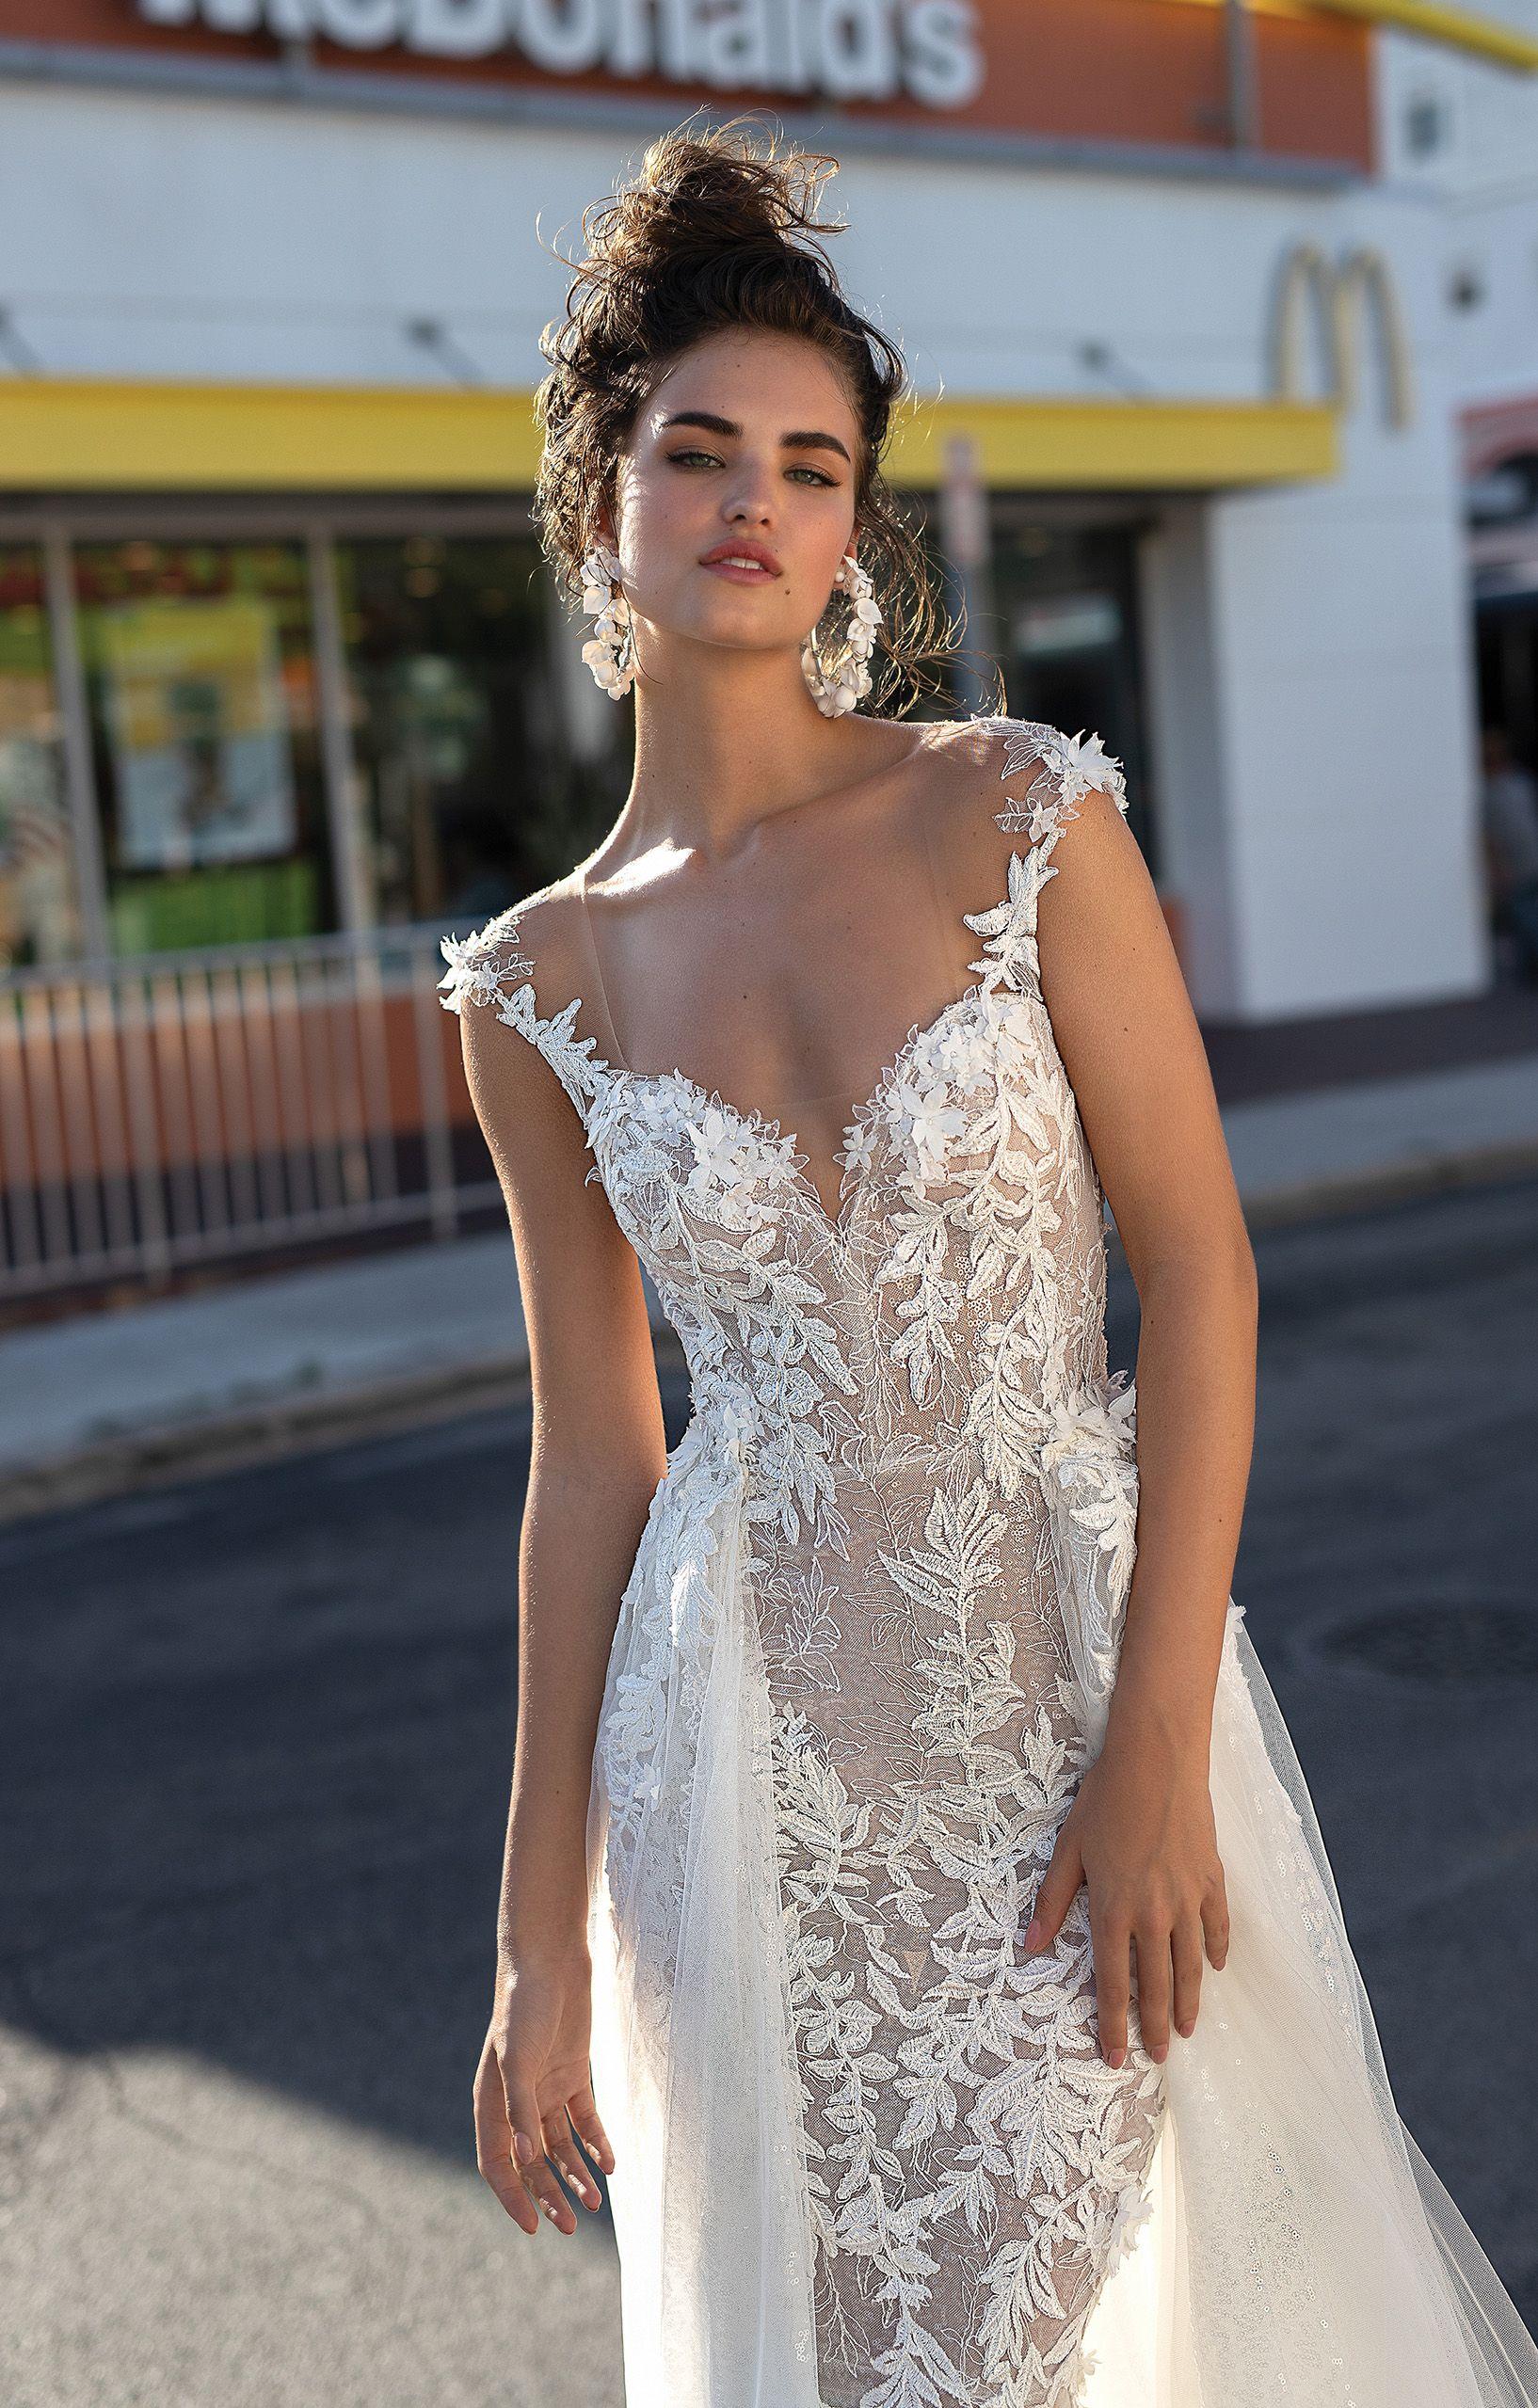 Night before wedding decorations january 2019 SS   Berta  Wedding  Pinterest  Army wedding Wedding dress